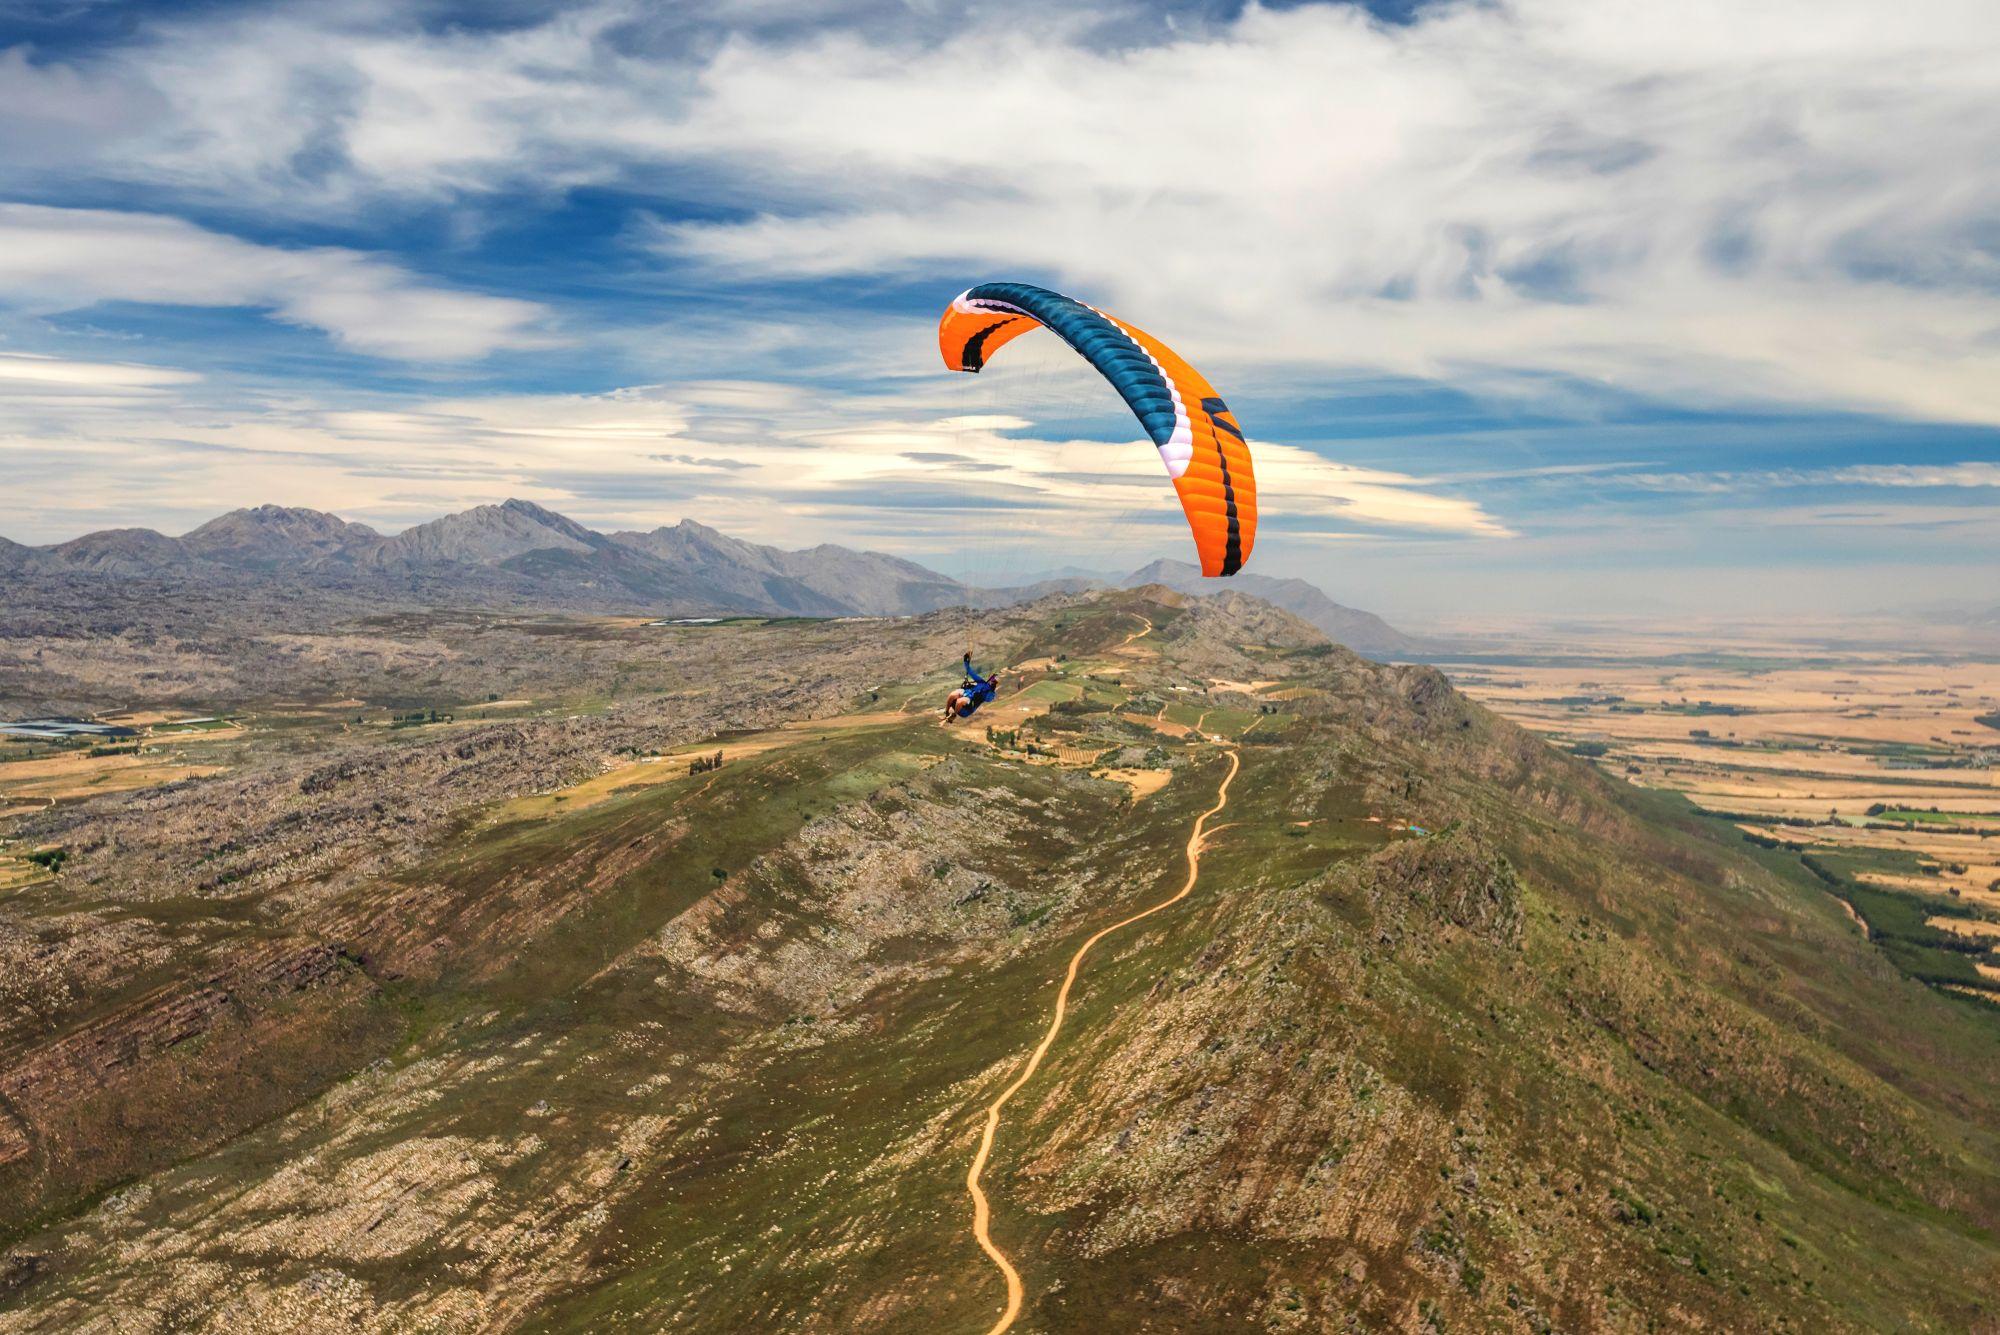 SkyWalk Mescal 5  available at FlySpain Paragliding shop